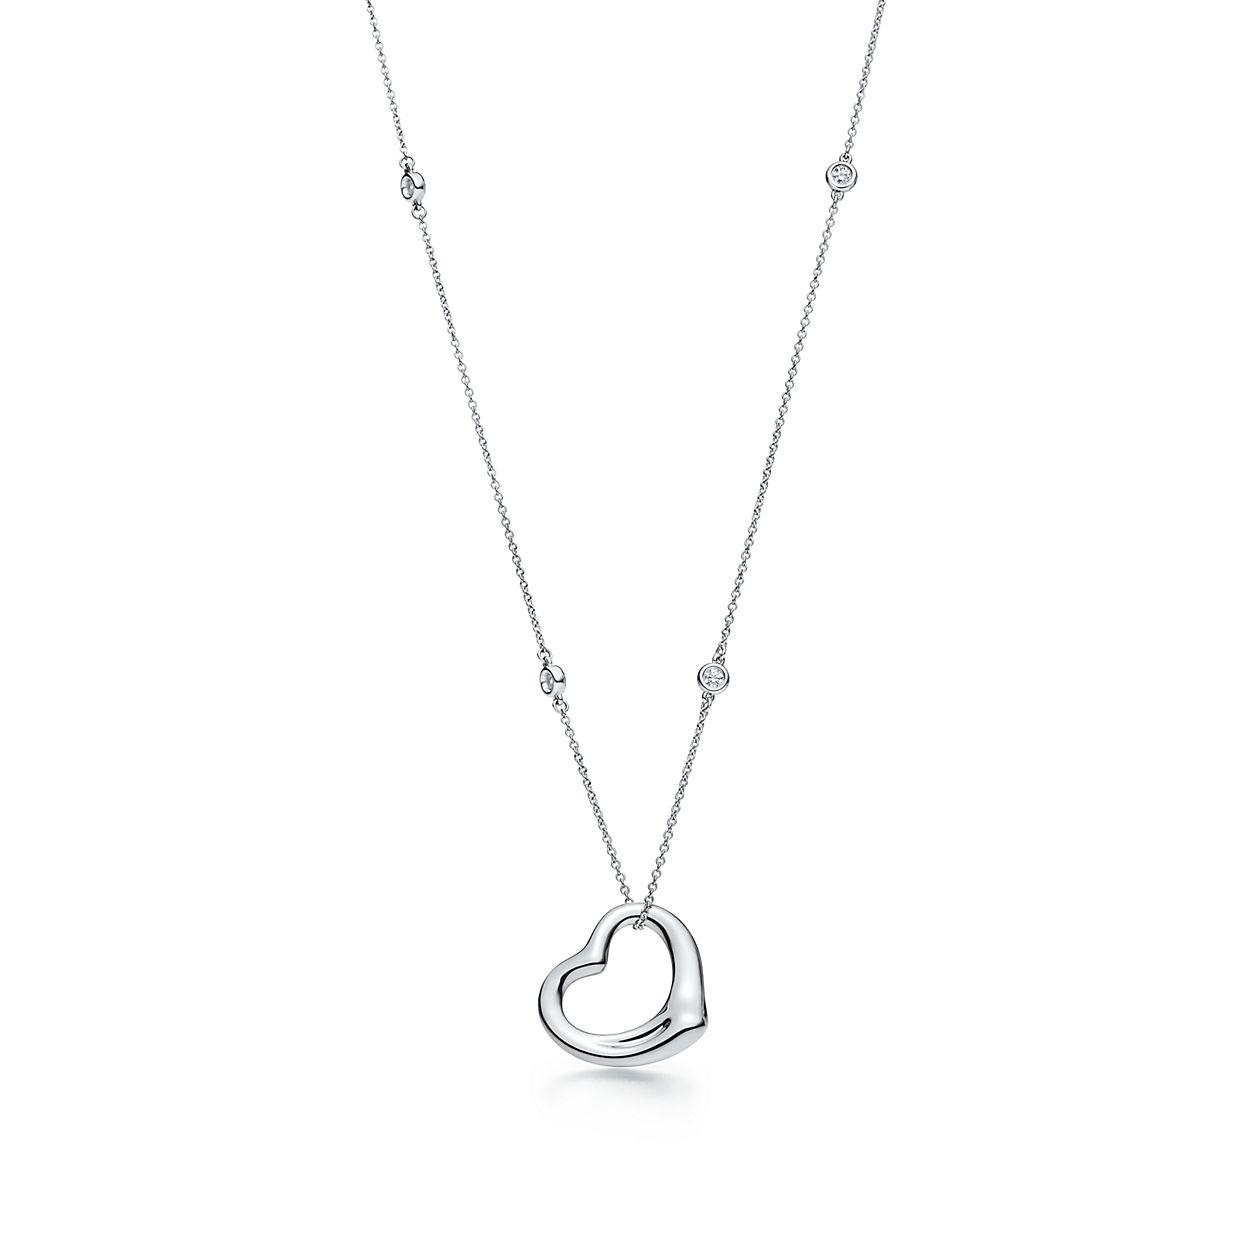 Elsa Peretti Diamonds by the Yard Open Heart pendant in sterling silver Tiffany & Co. ChZyV6q5I